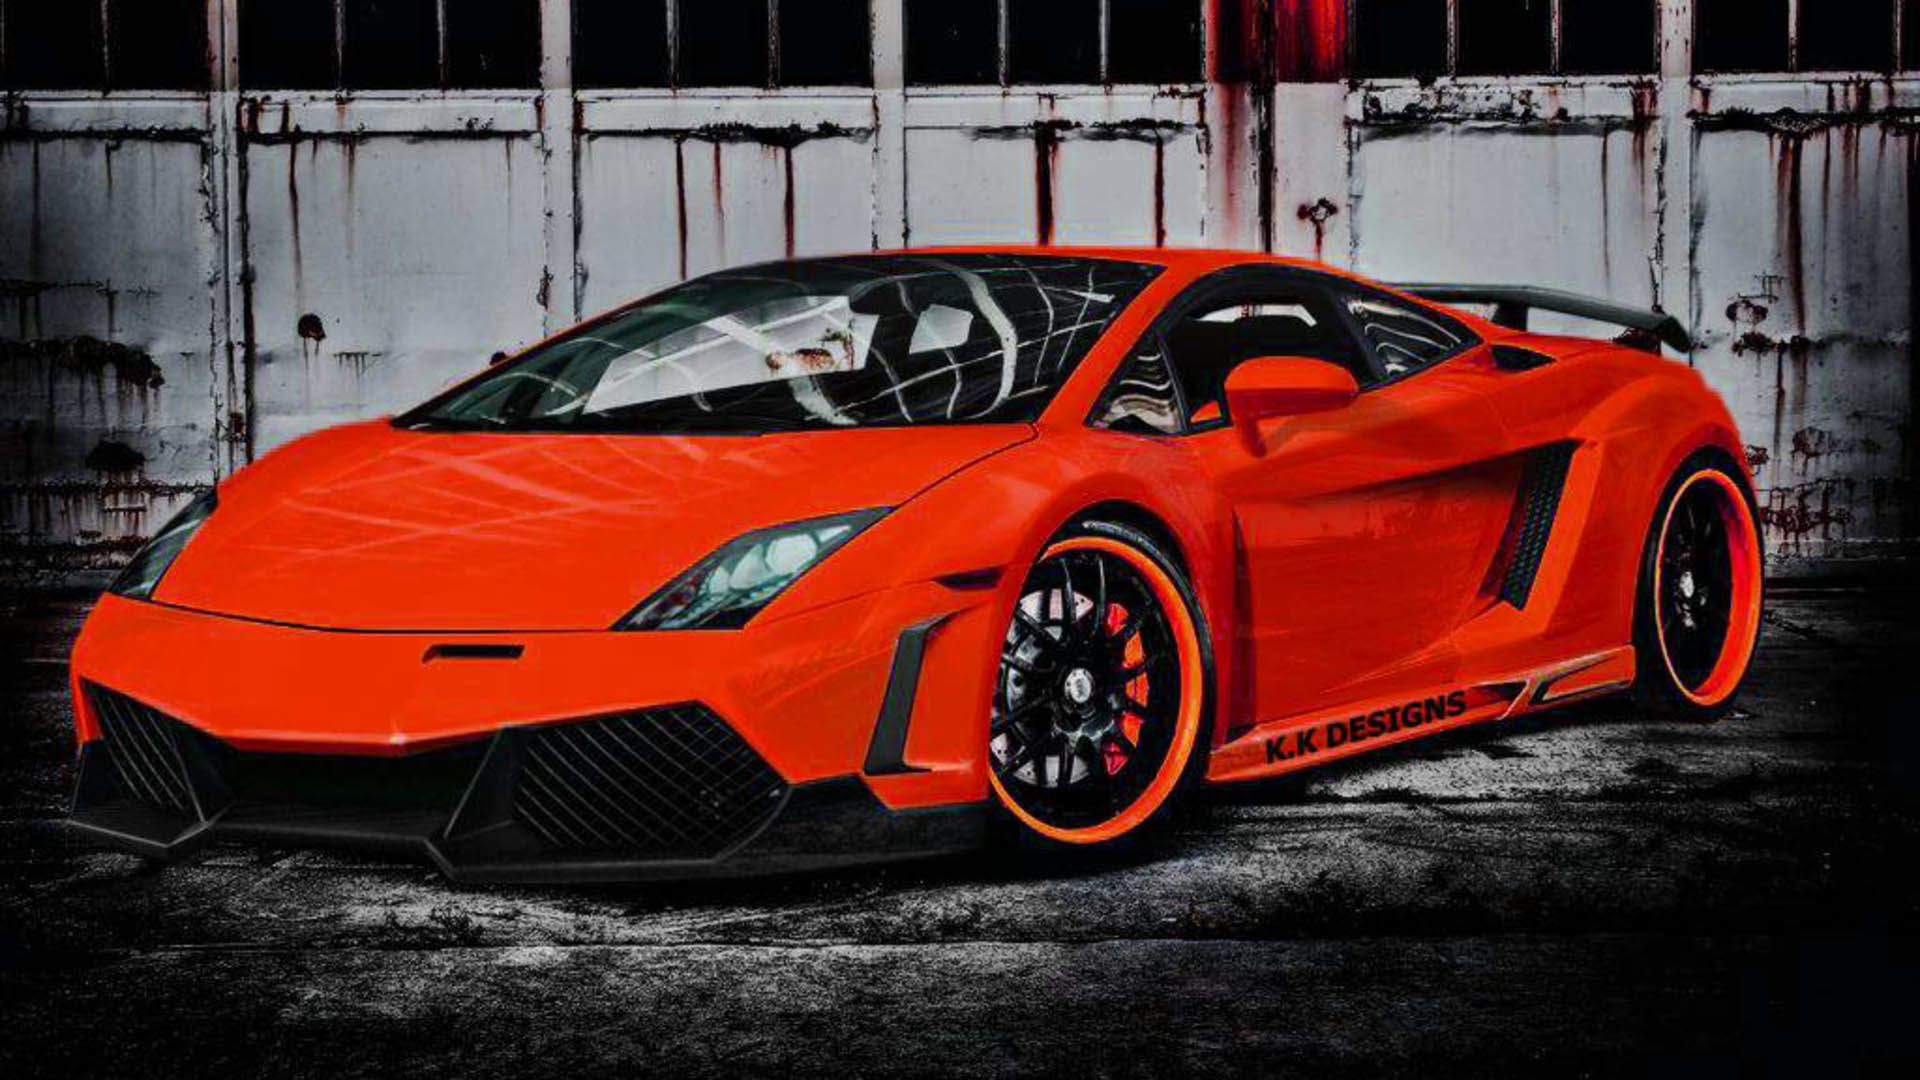 Lamborghini Gallardo Wallpaper Hd Www Youthsportfoto Com Lamborghini